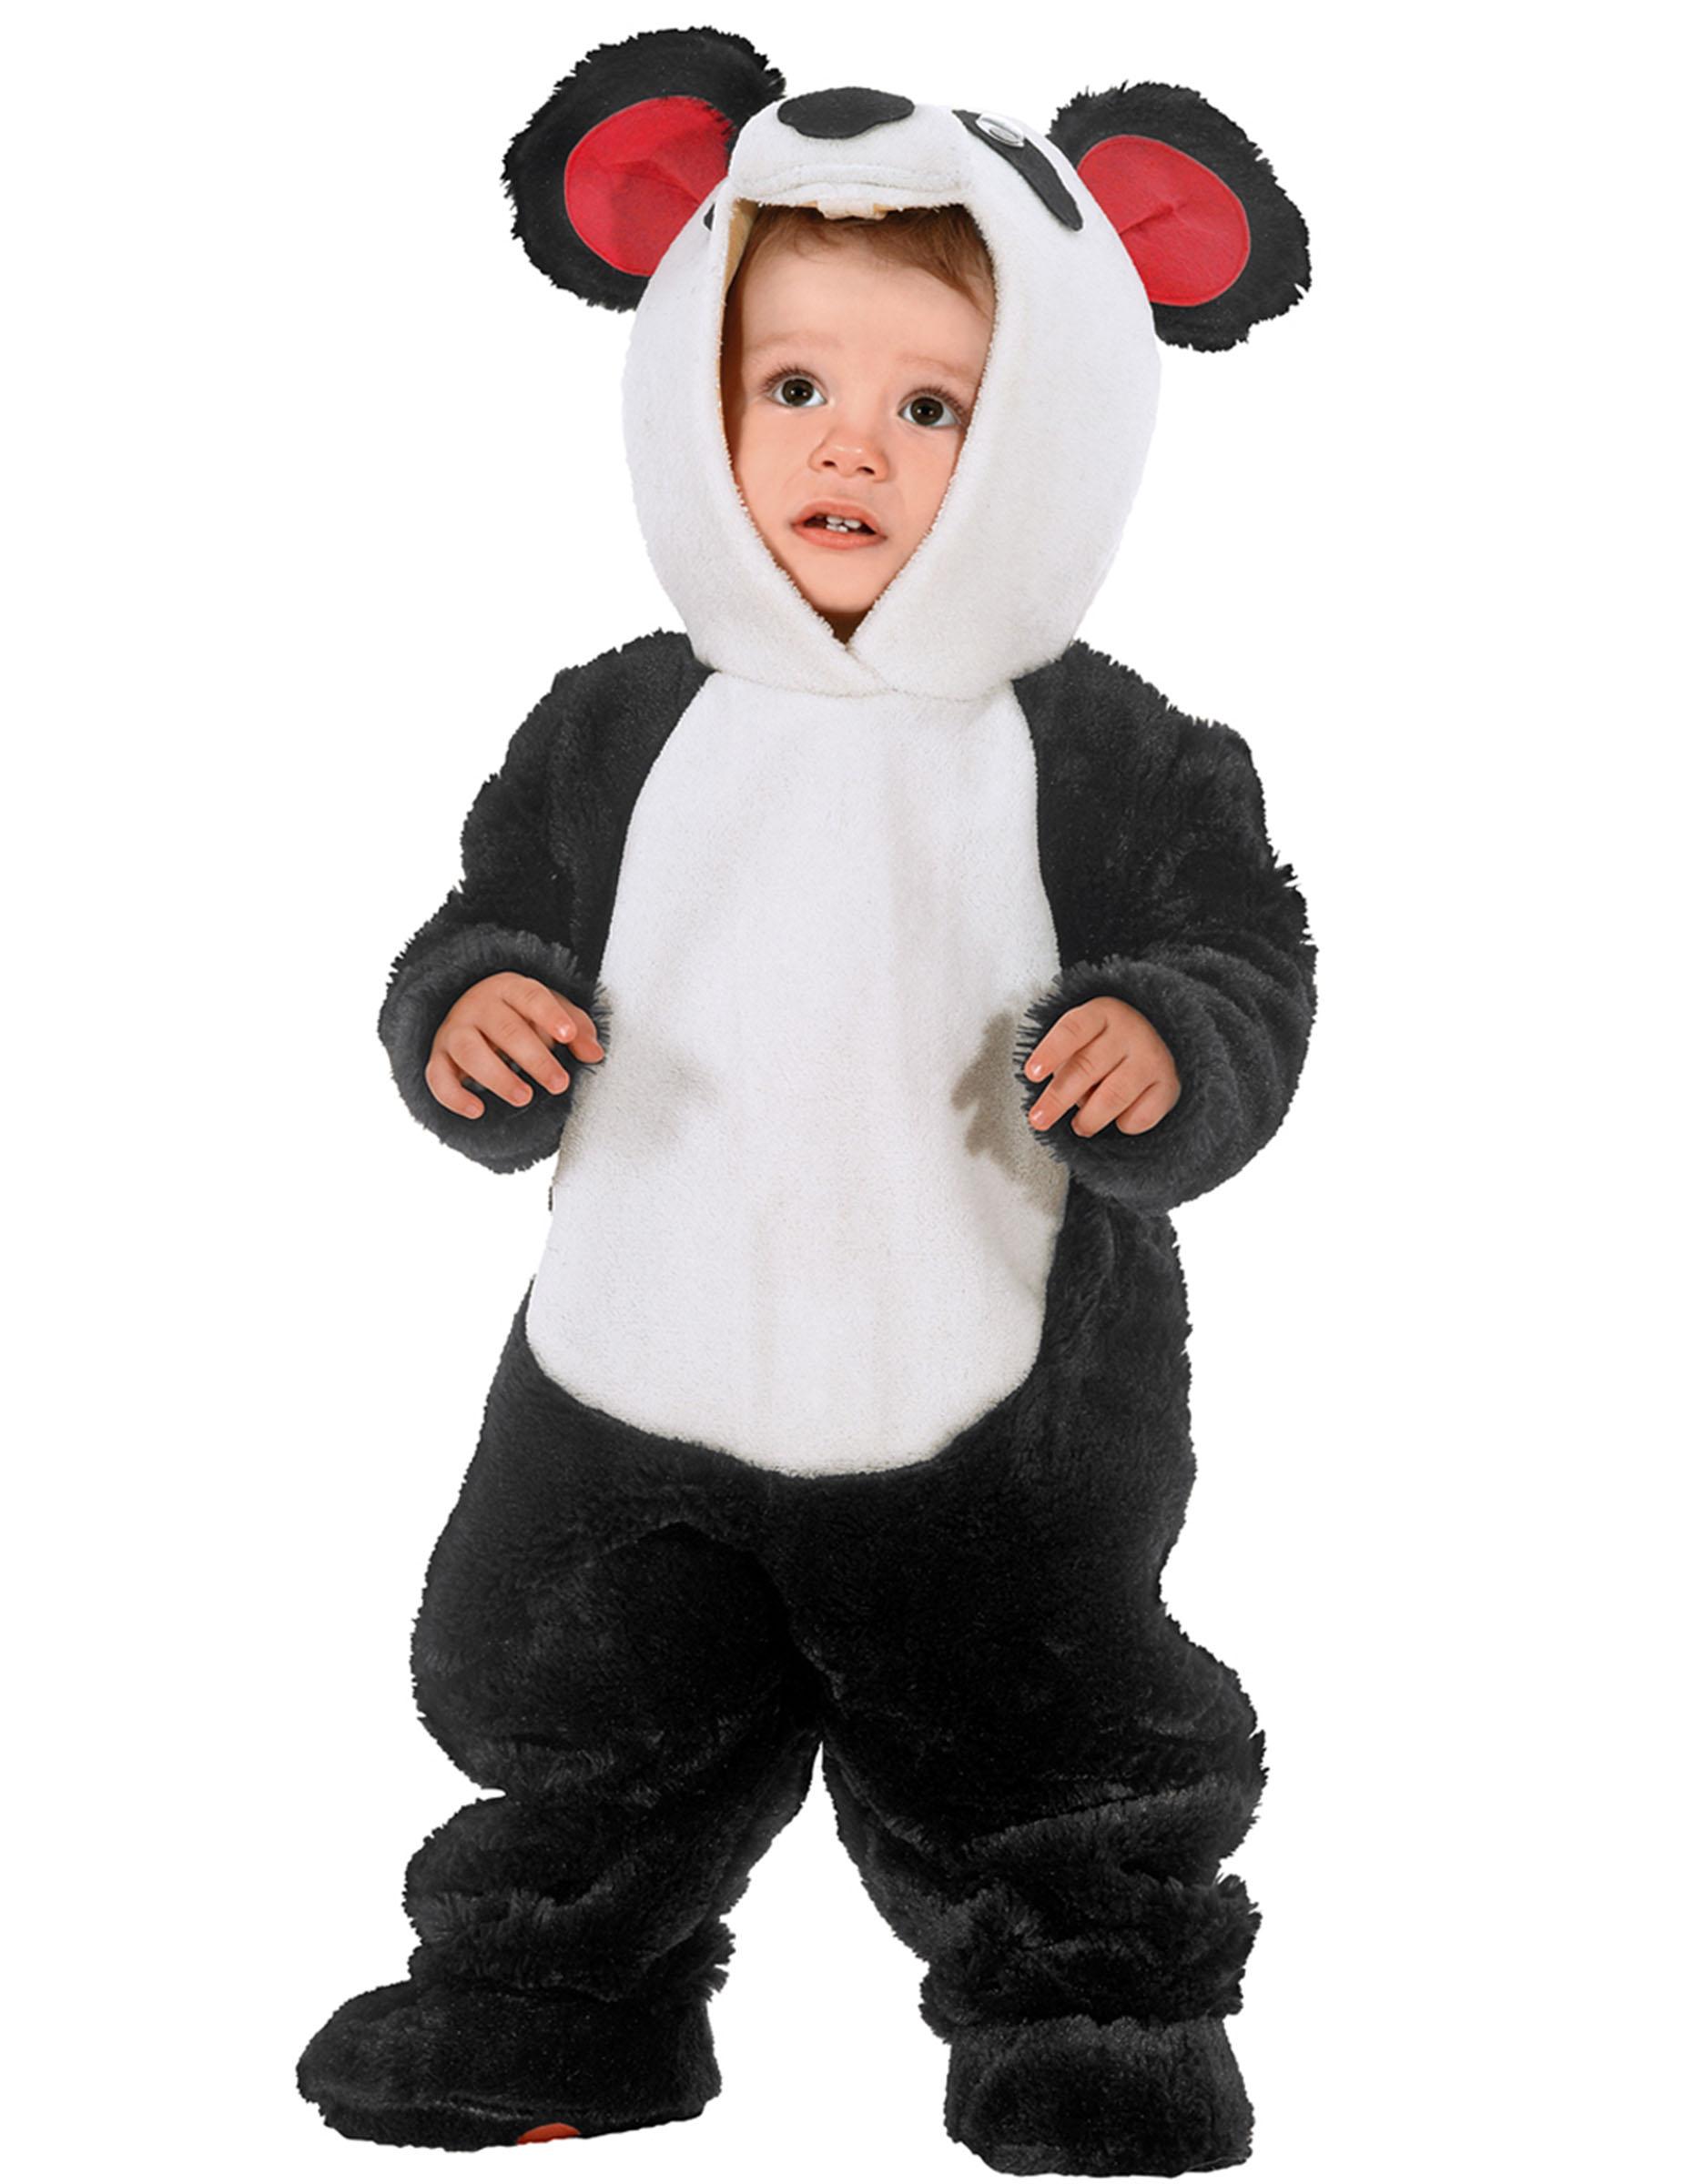 panda kostum baby overall schwarz weiss